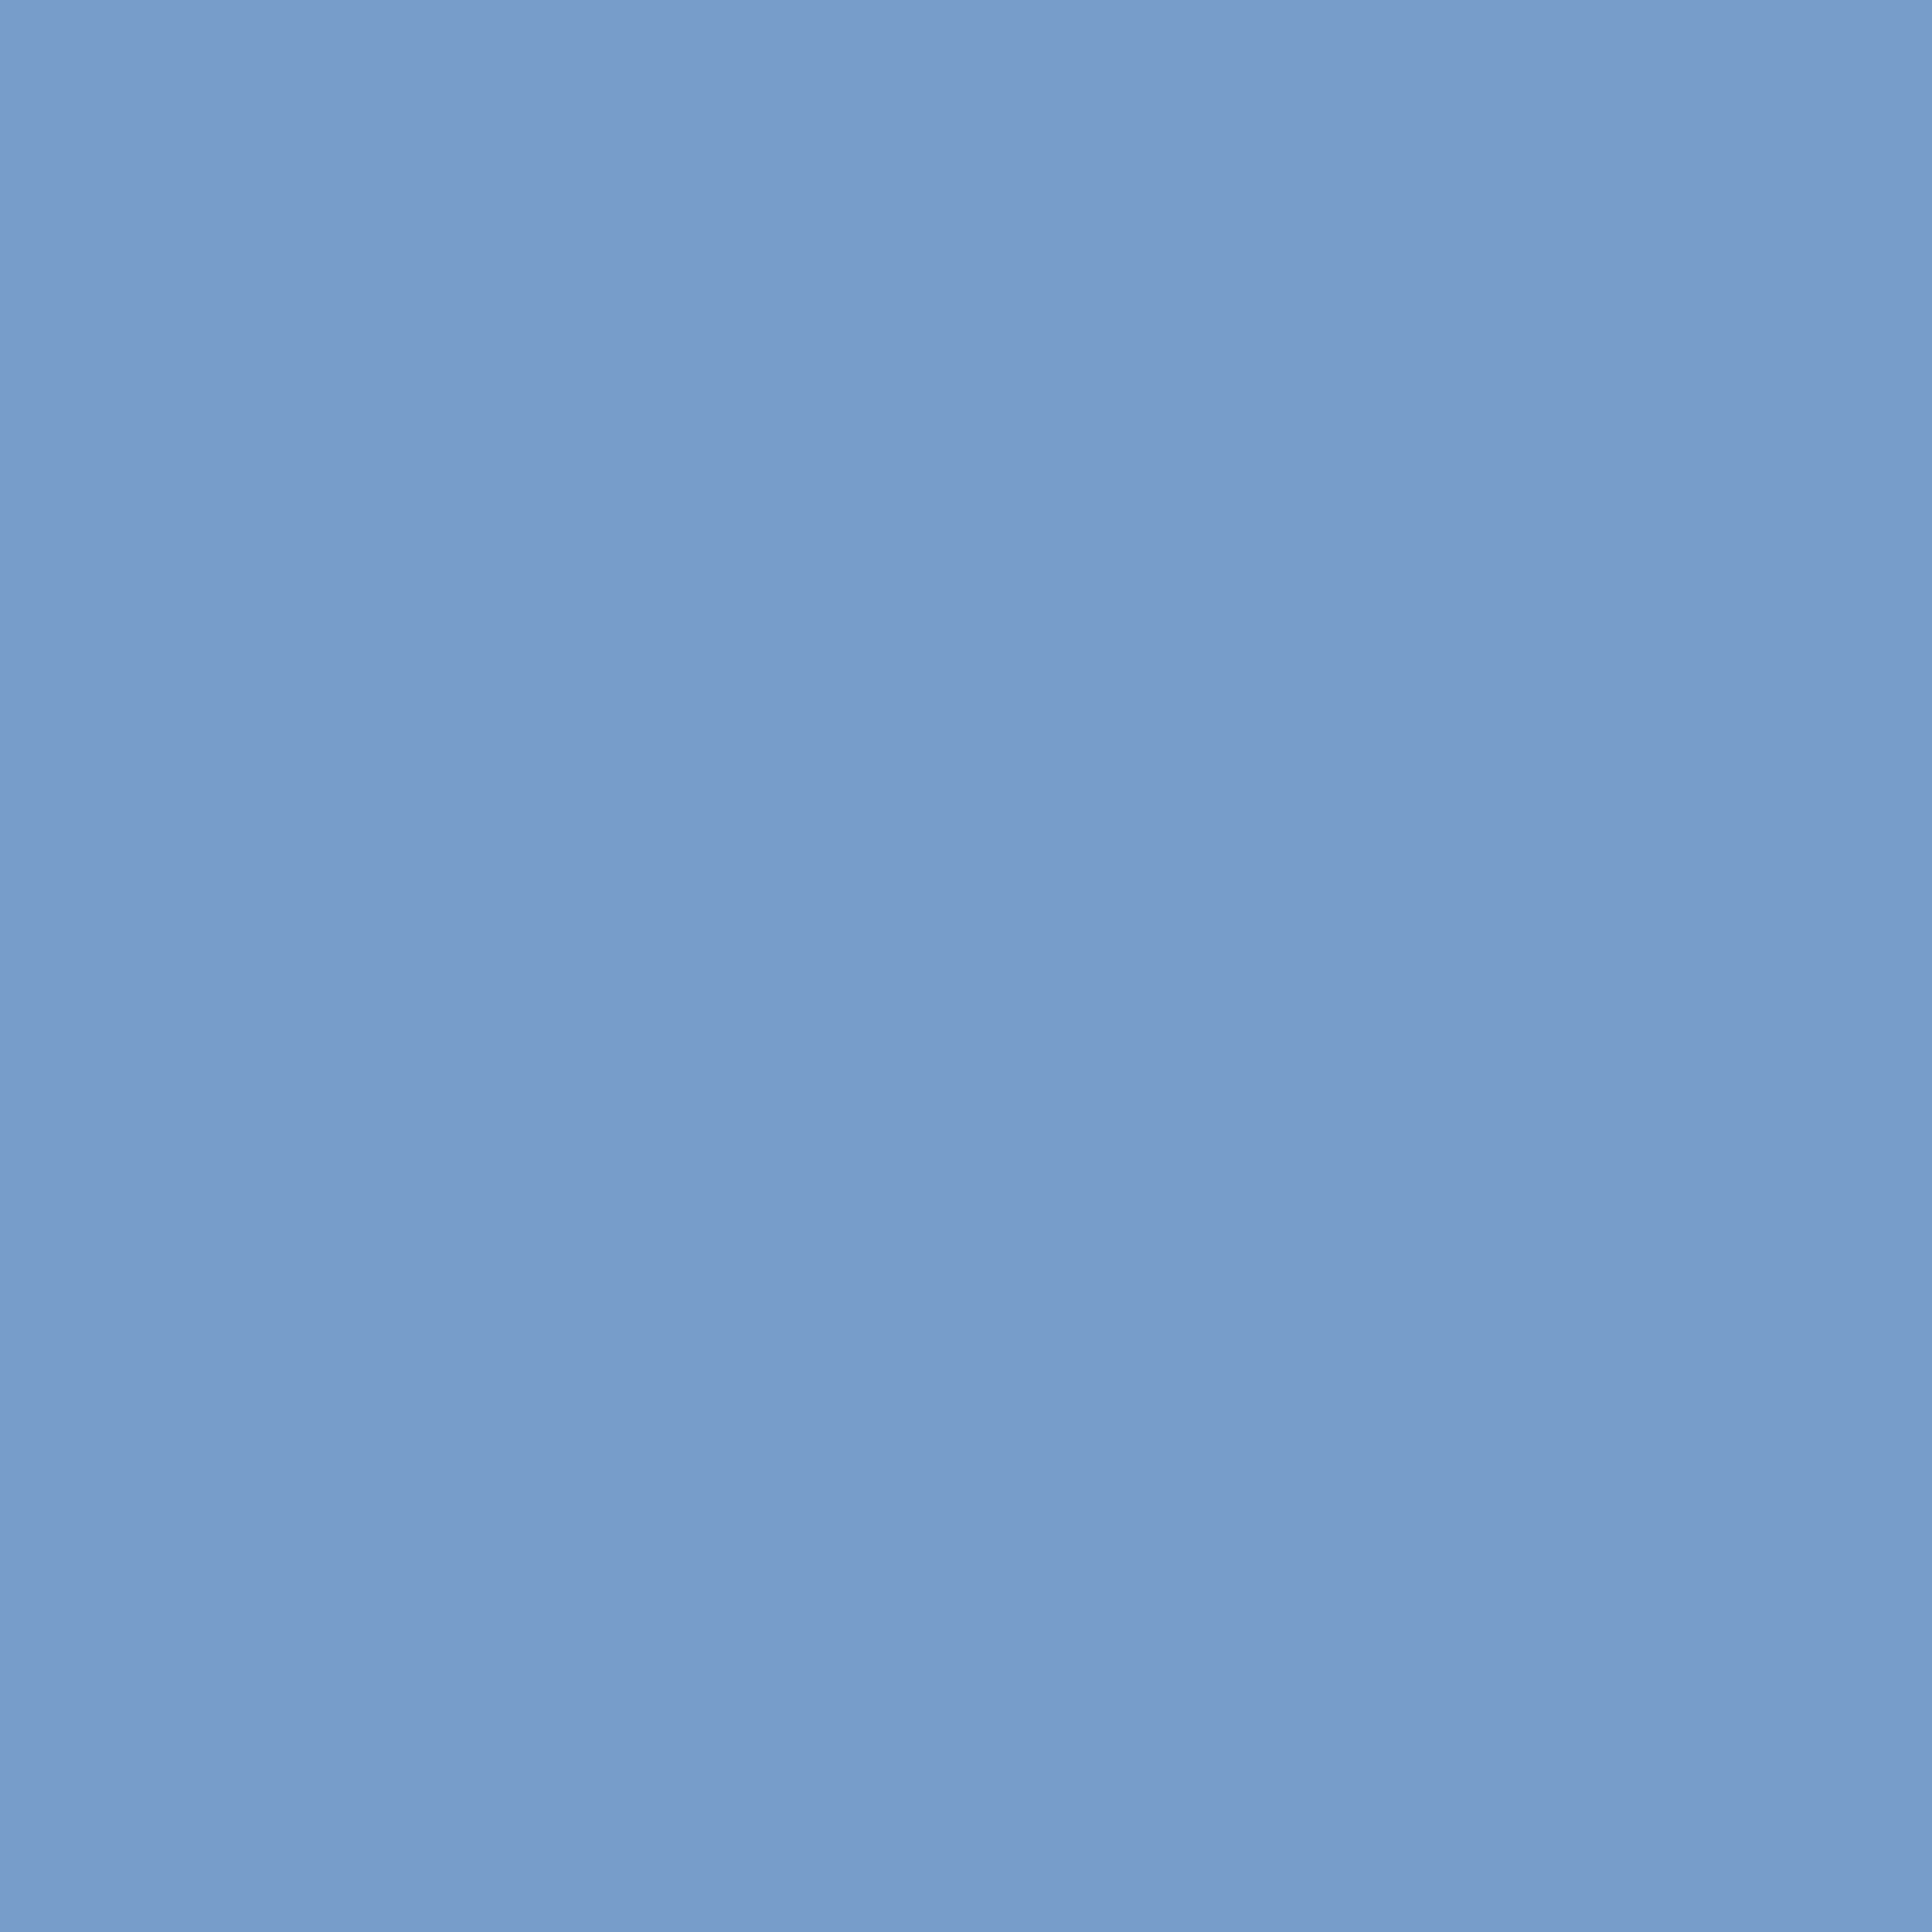 Pastel blue background